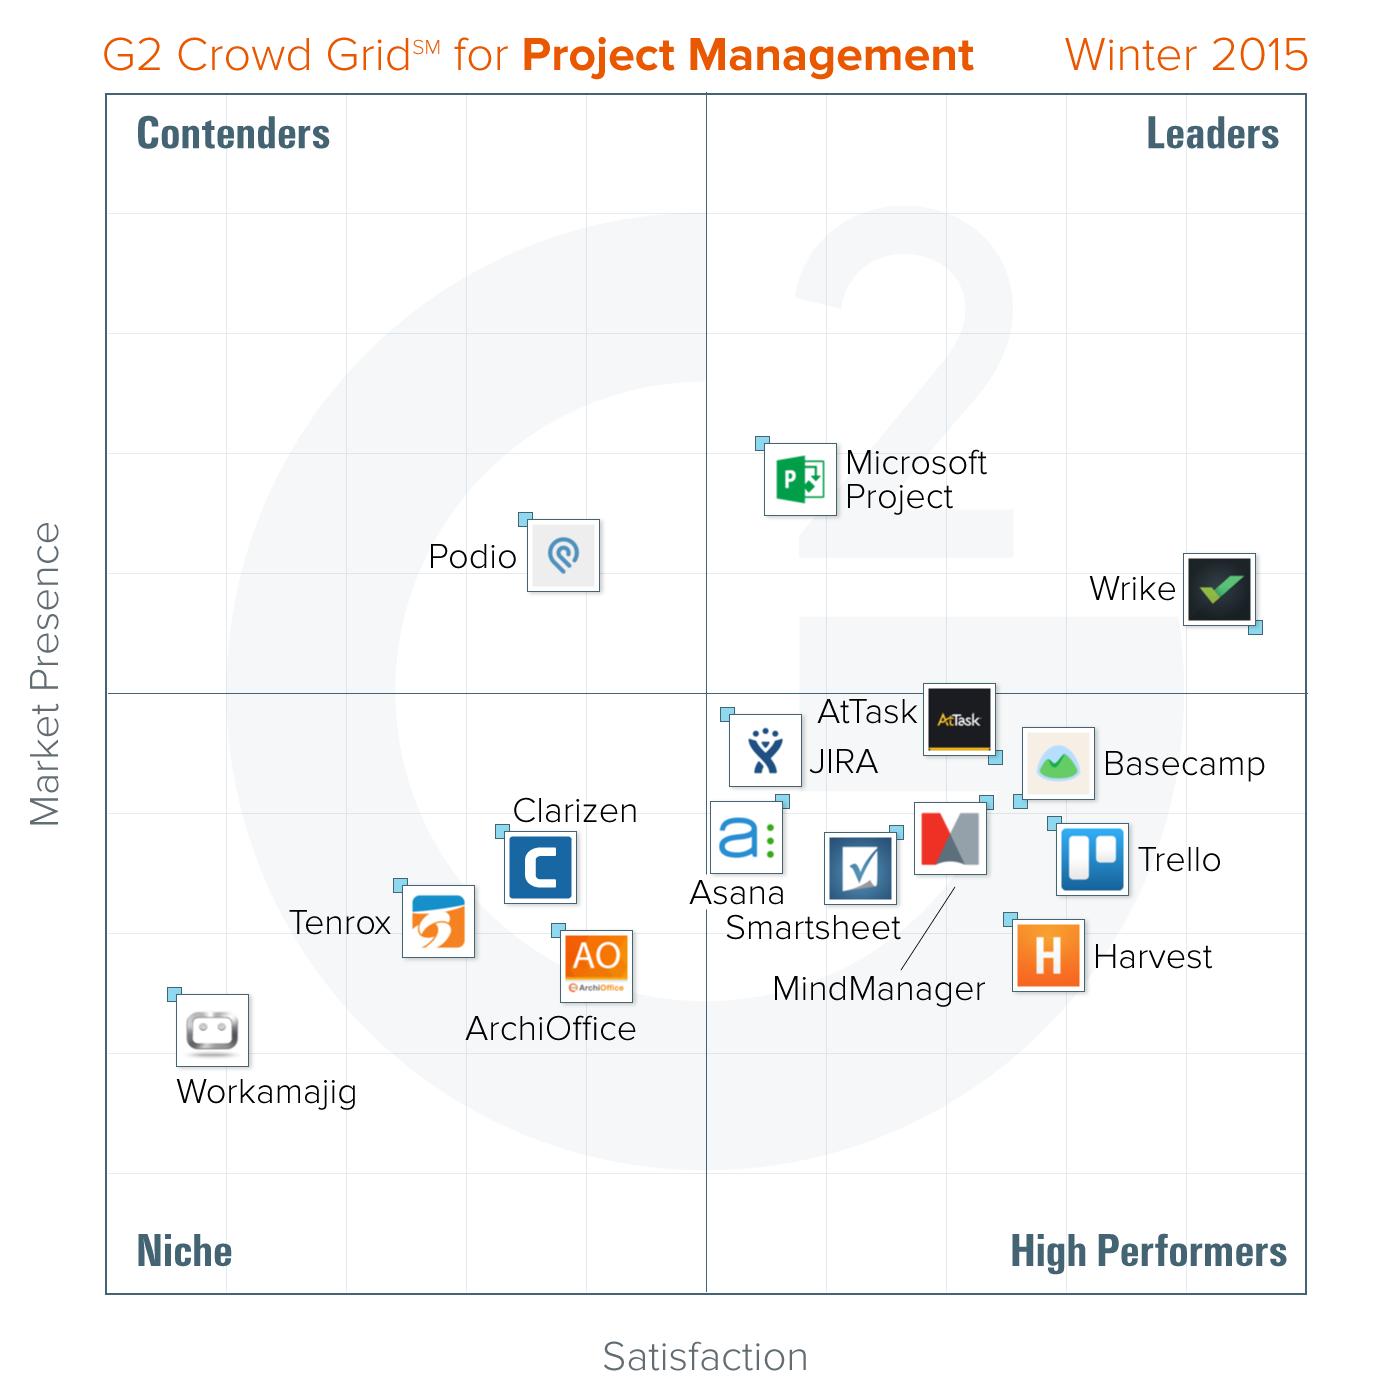 Best Project Management platforms: Winter 2015 report